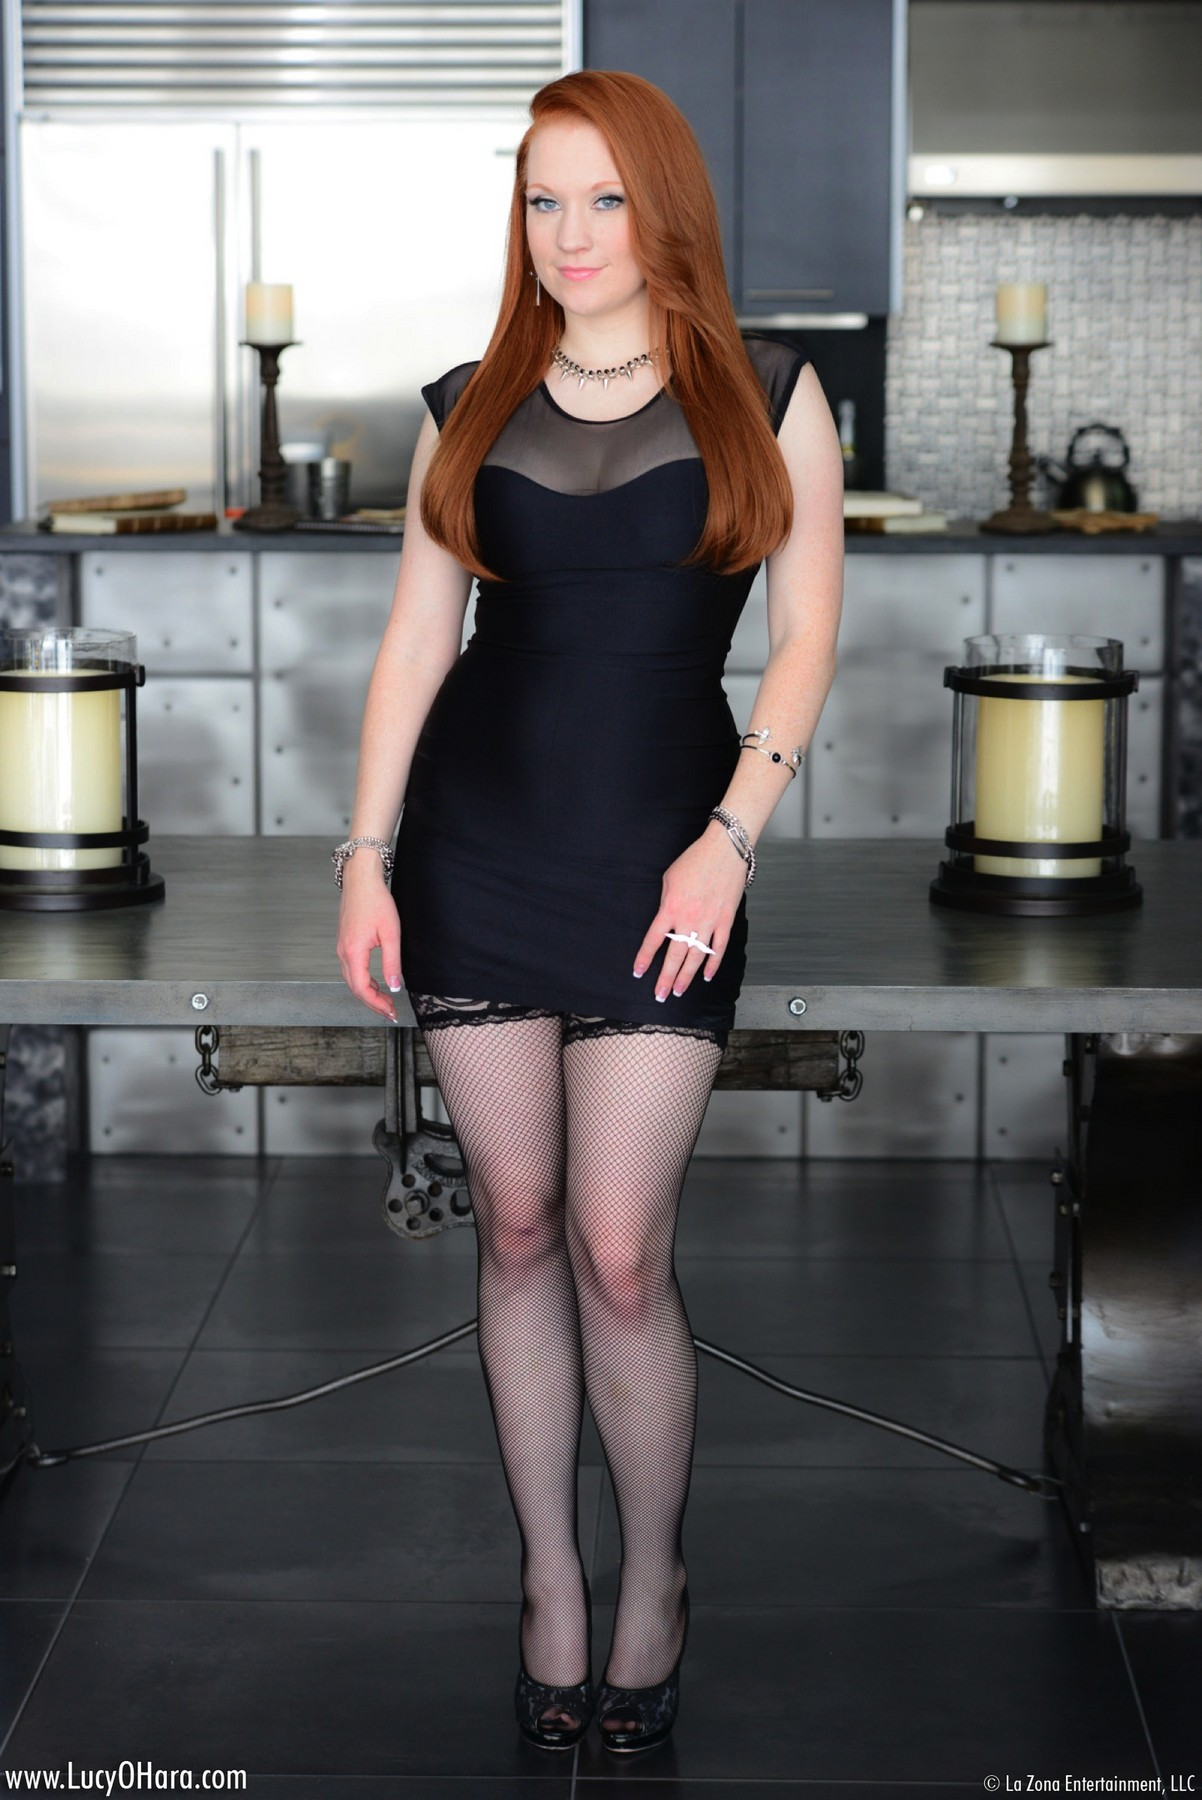 Lucy Ohara Black Stockings @ GirlzNation.com